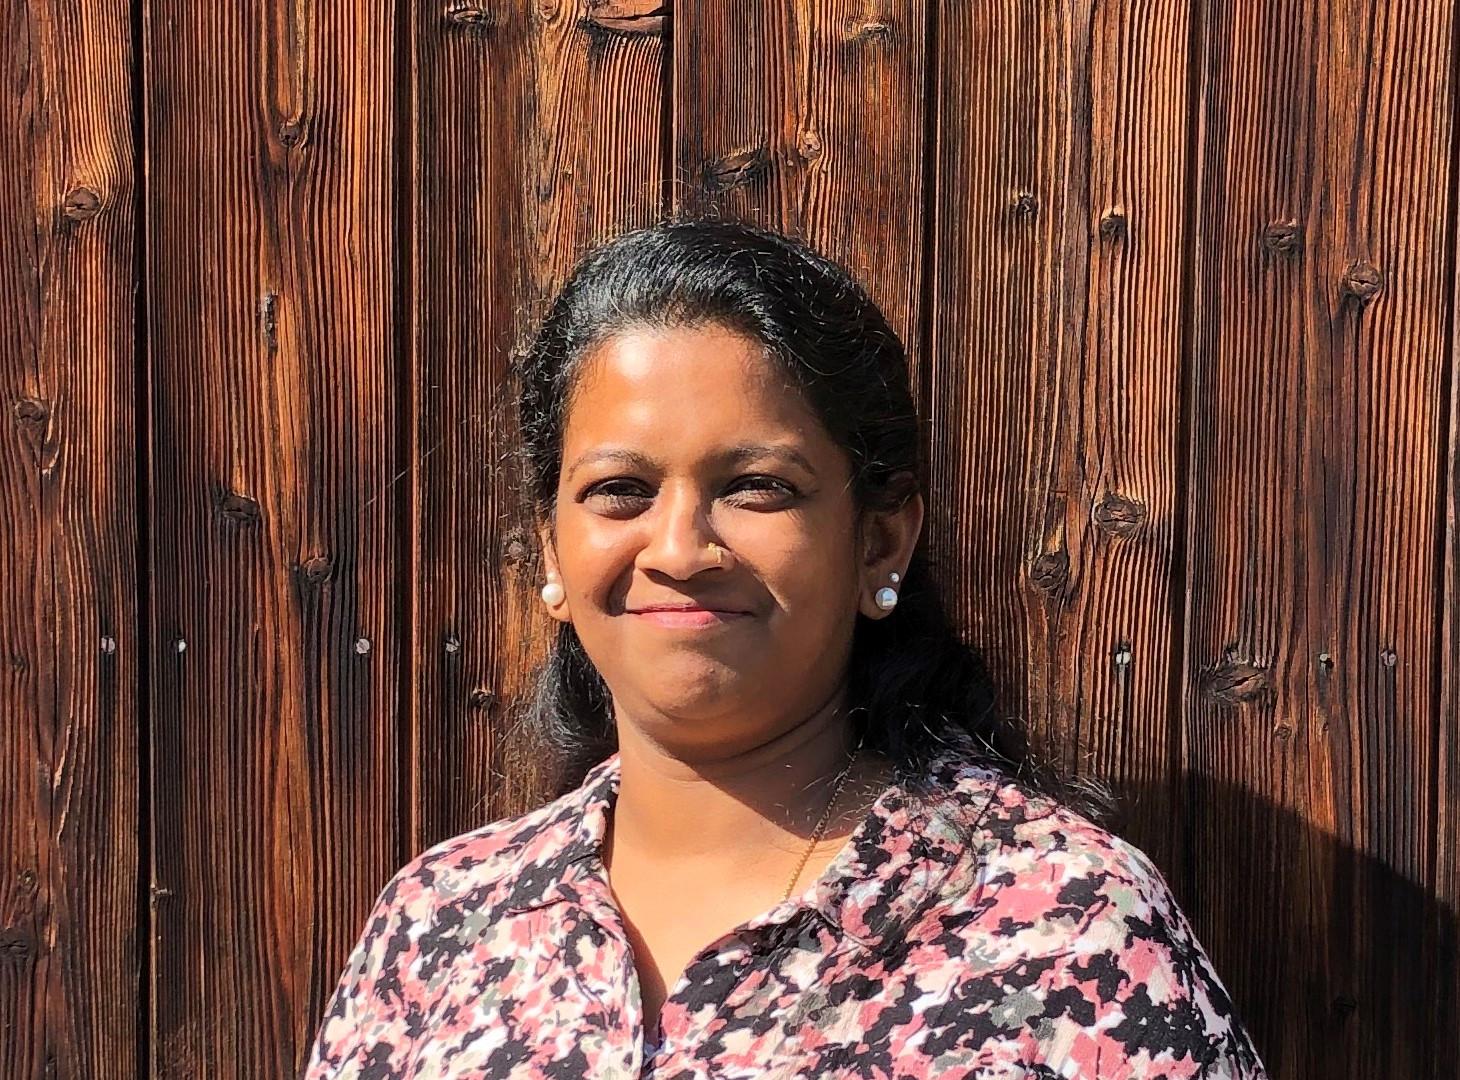 Sugitha Sarvanathan